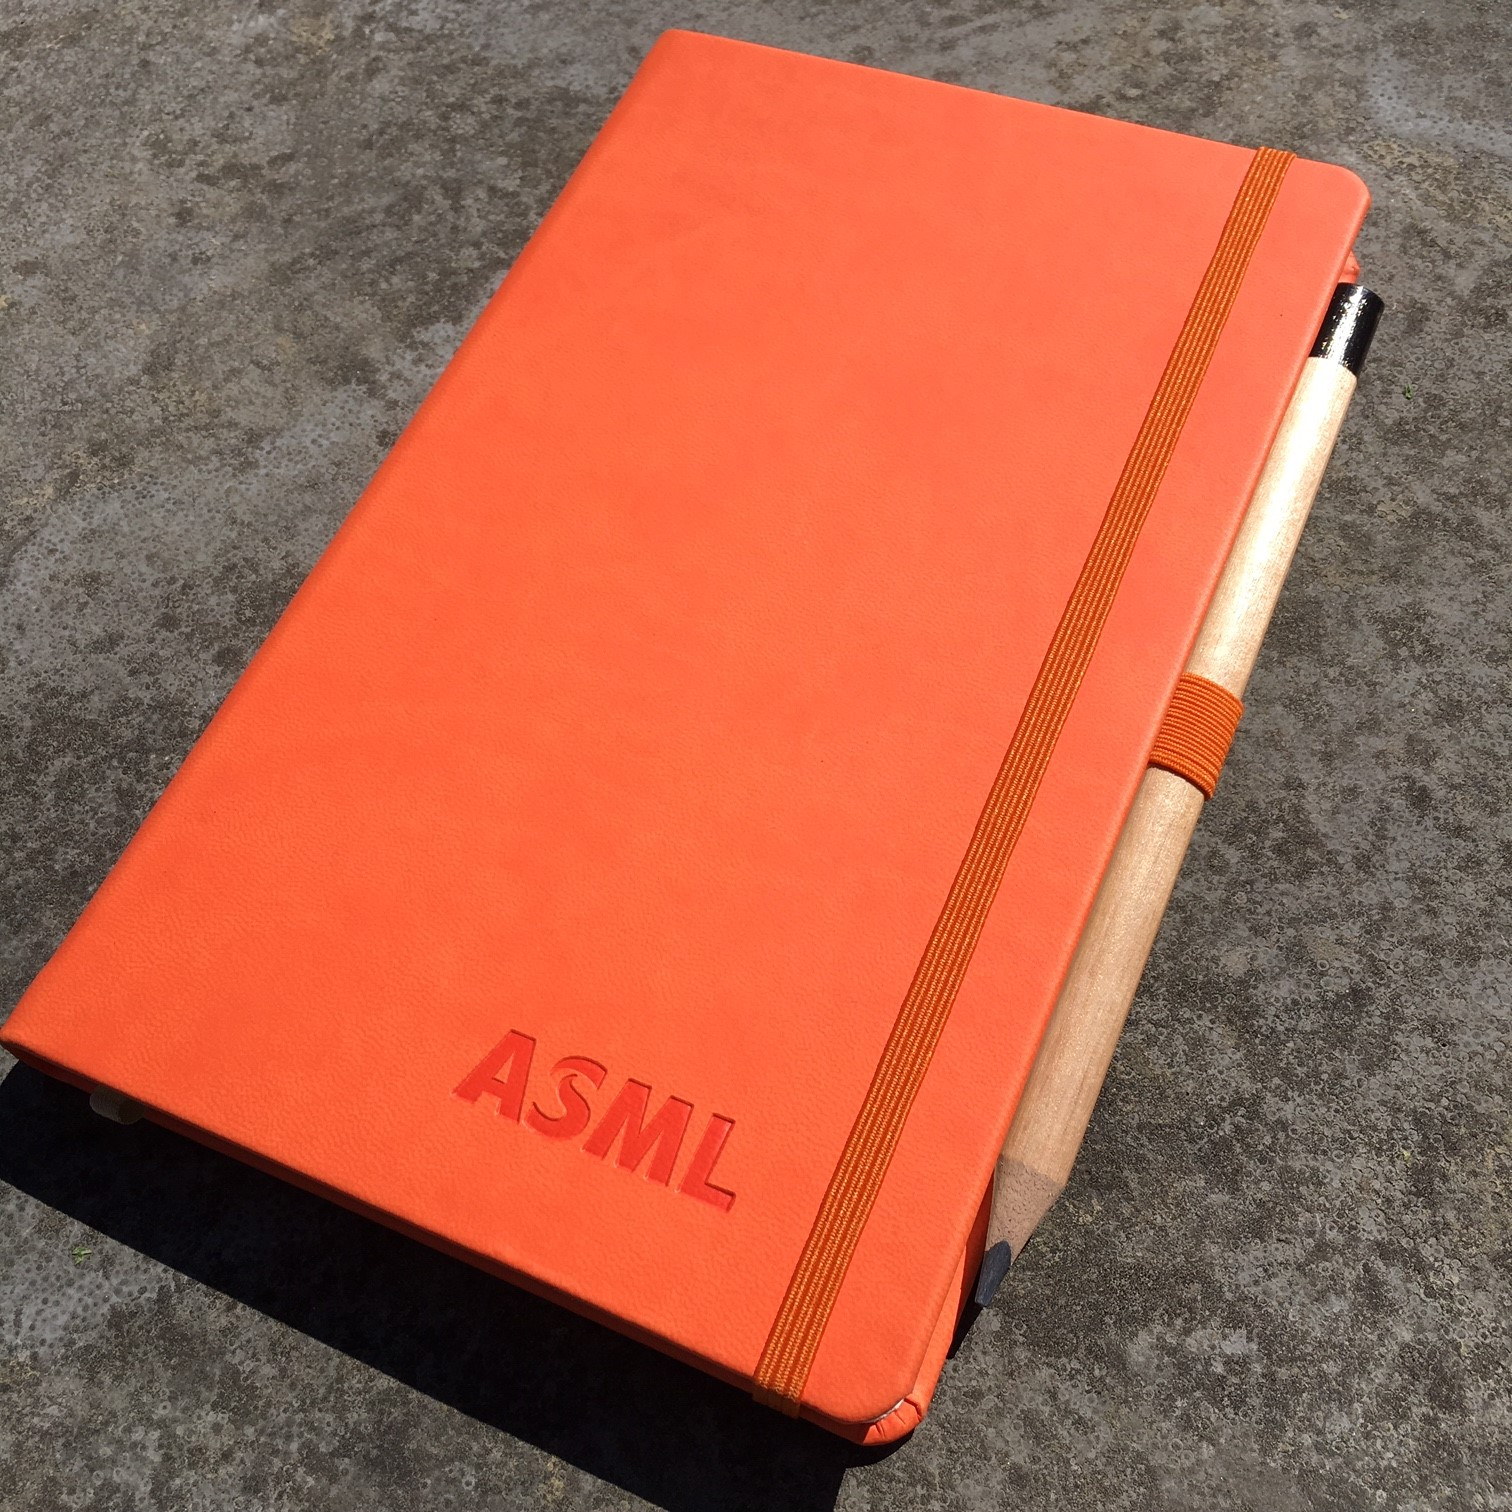 Castelli Notitieboek - ASML Oranje